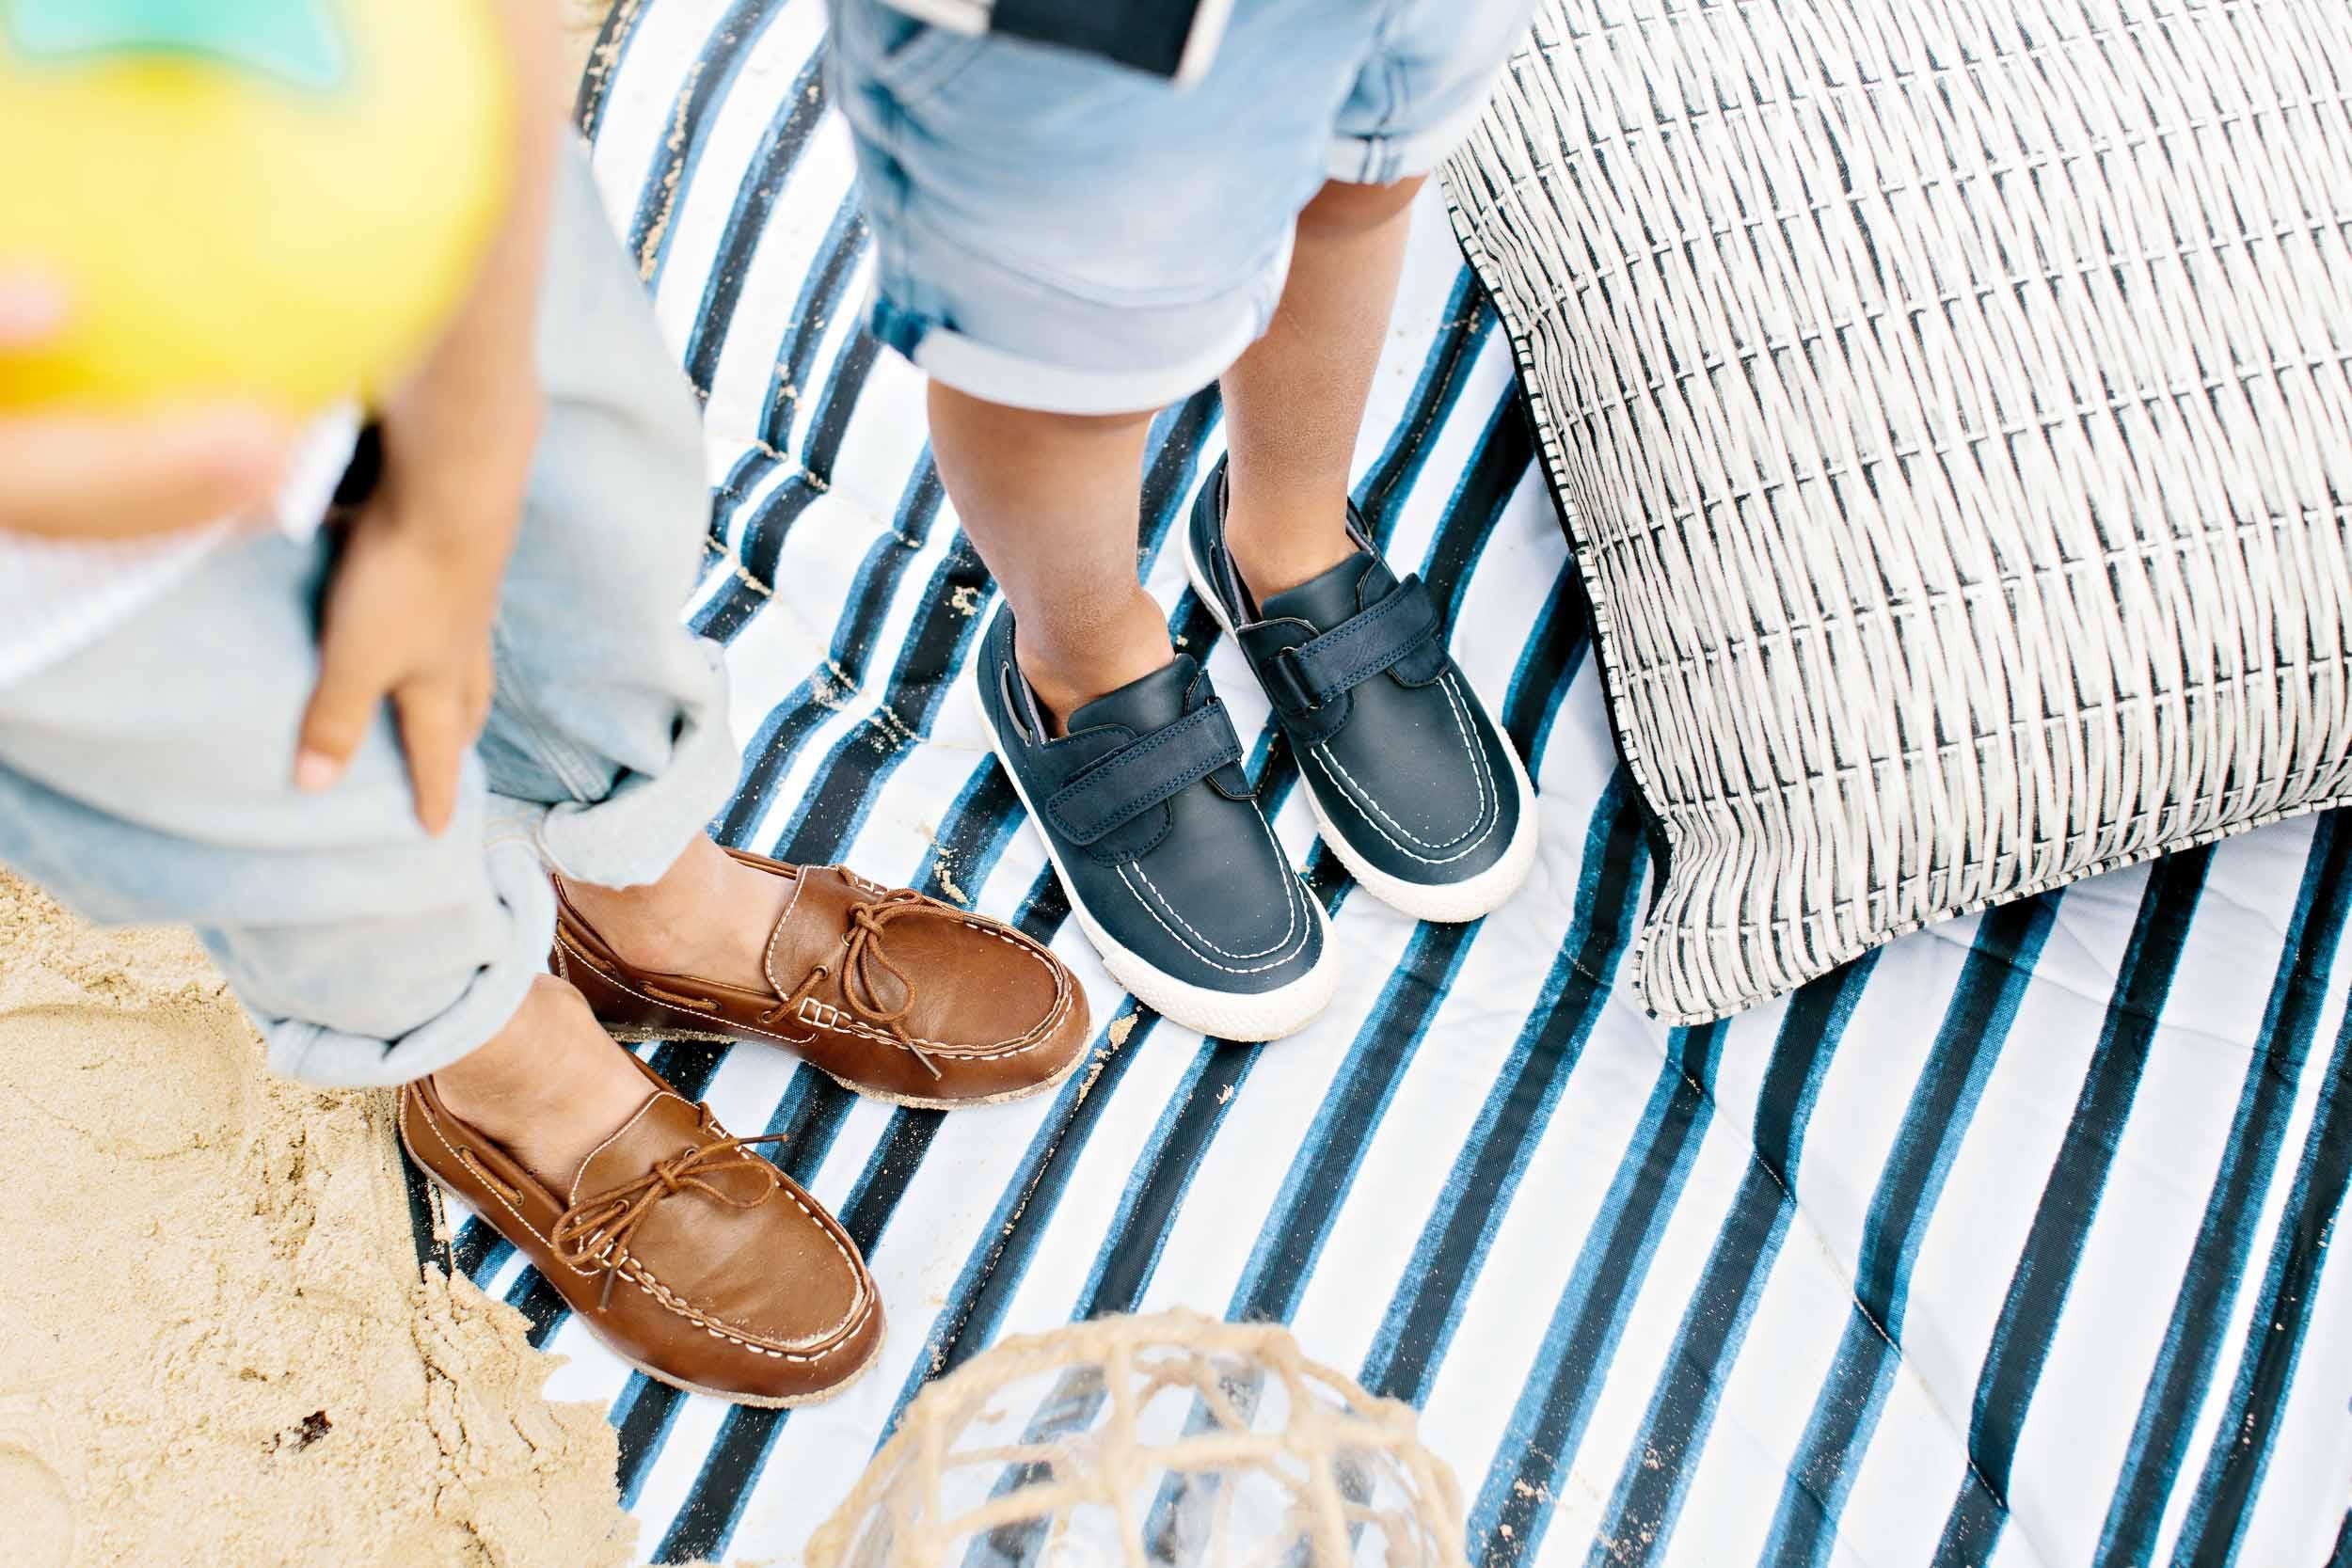 Kas-Richards-LENZO_Betts-Kids-Shoes-220.jpg